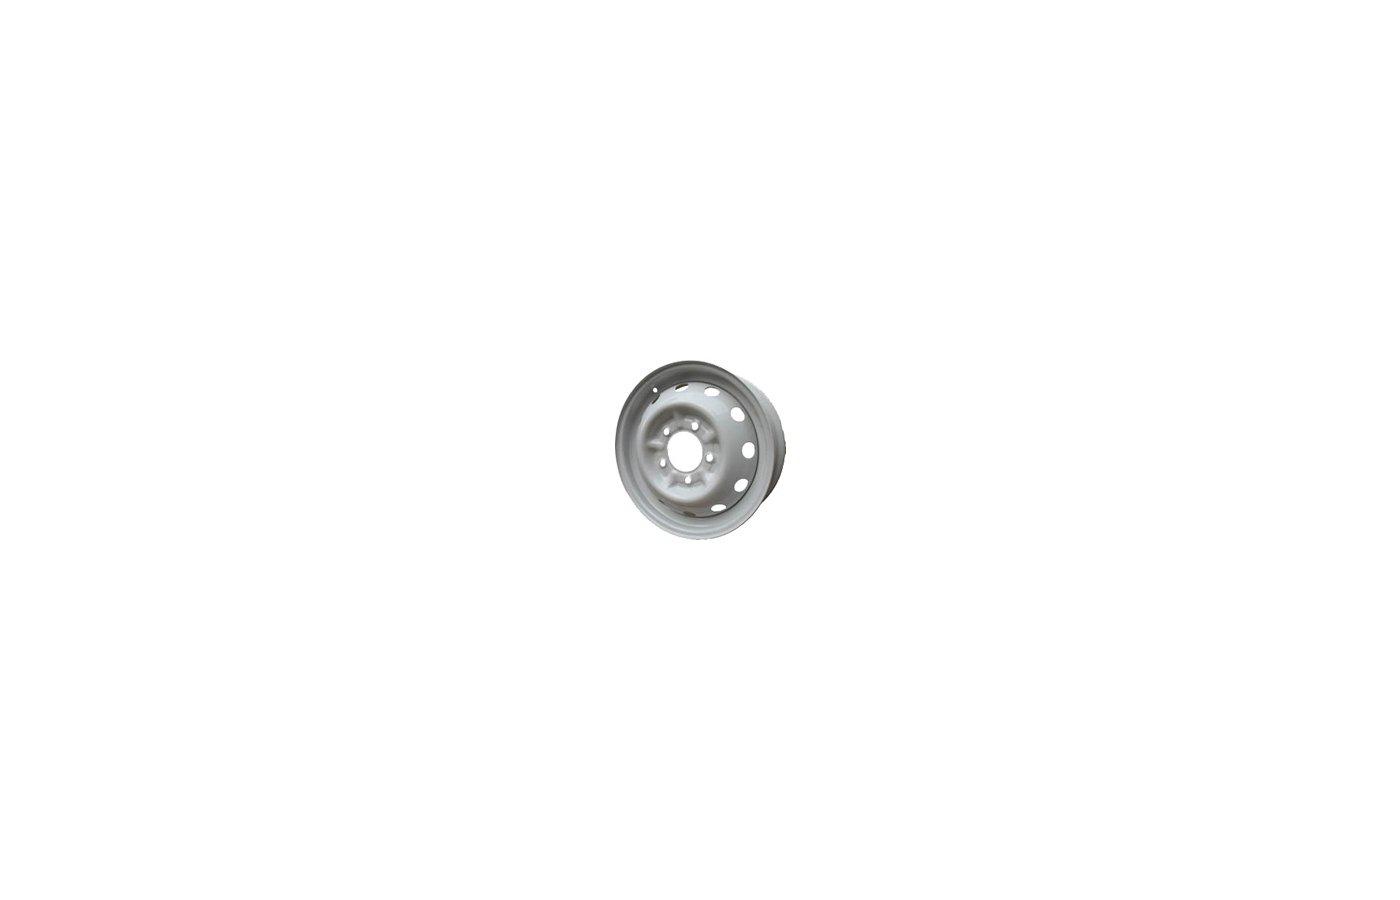 Диск ГАЗ УАЗ-3162 6.5x16/5x139.7 D108 ET40